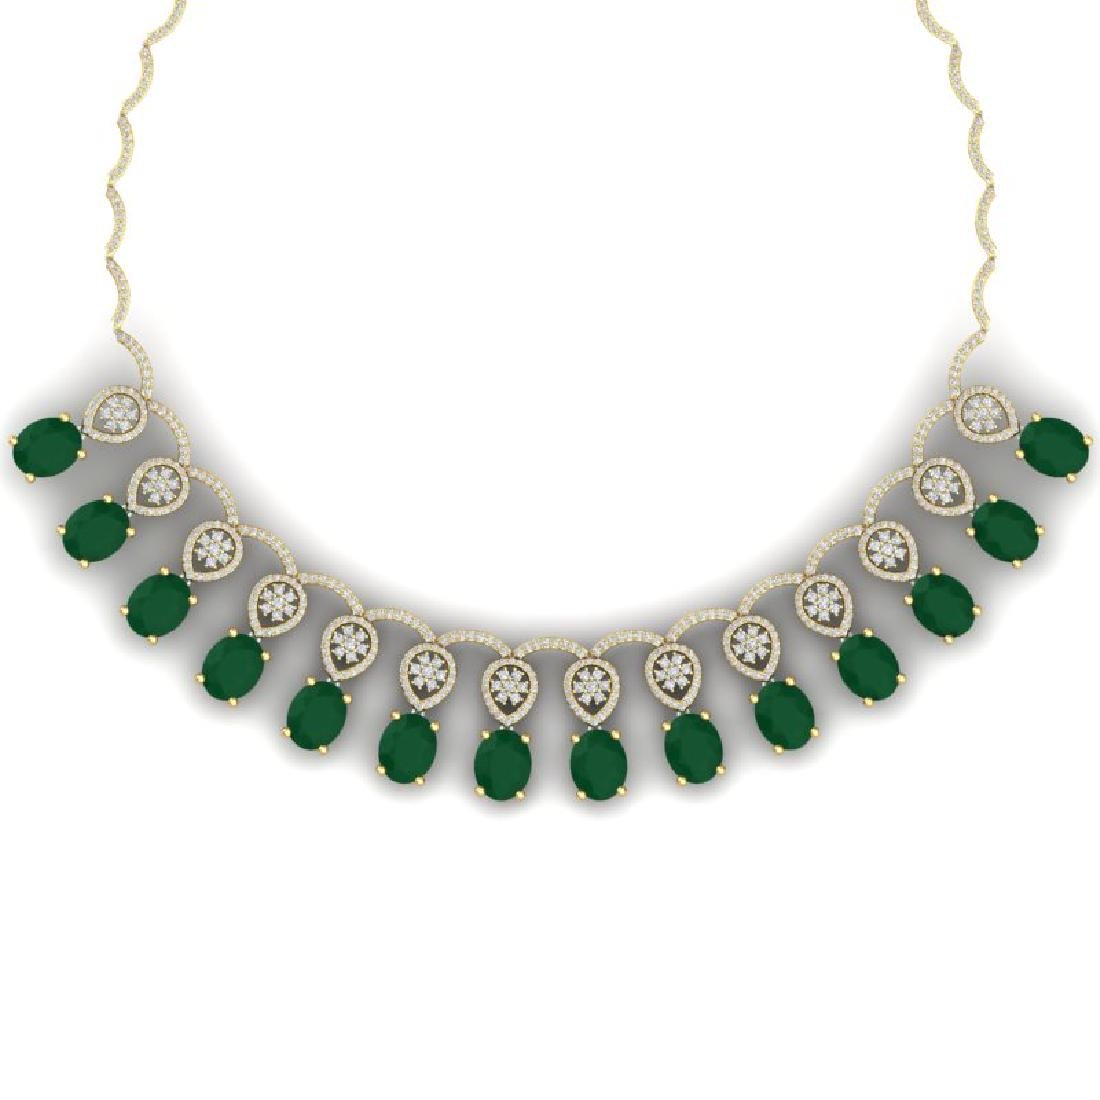 54.05 CTW Royalty Emerald & VS Diamond Necklace 18K